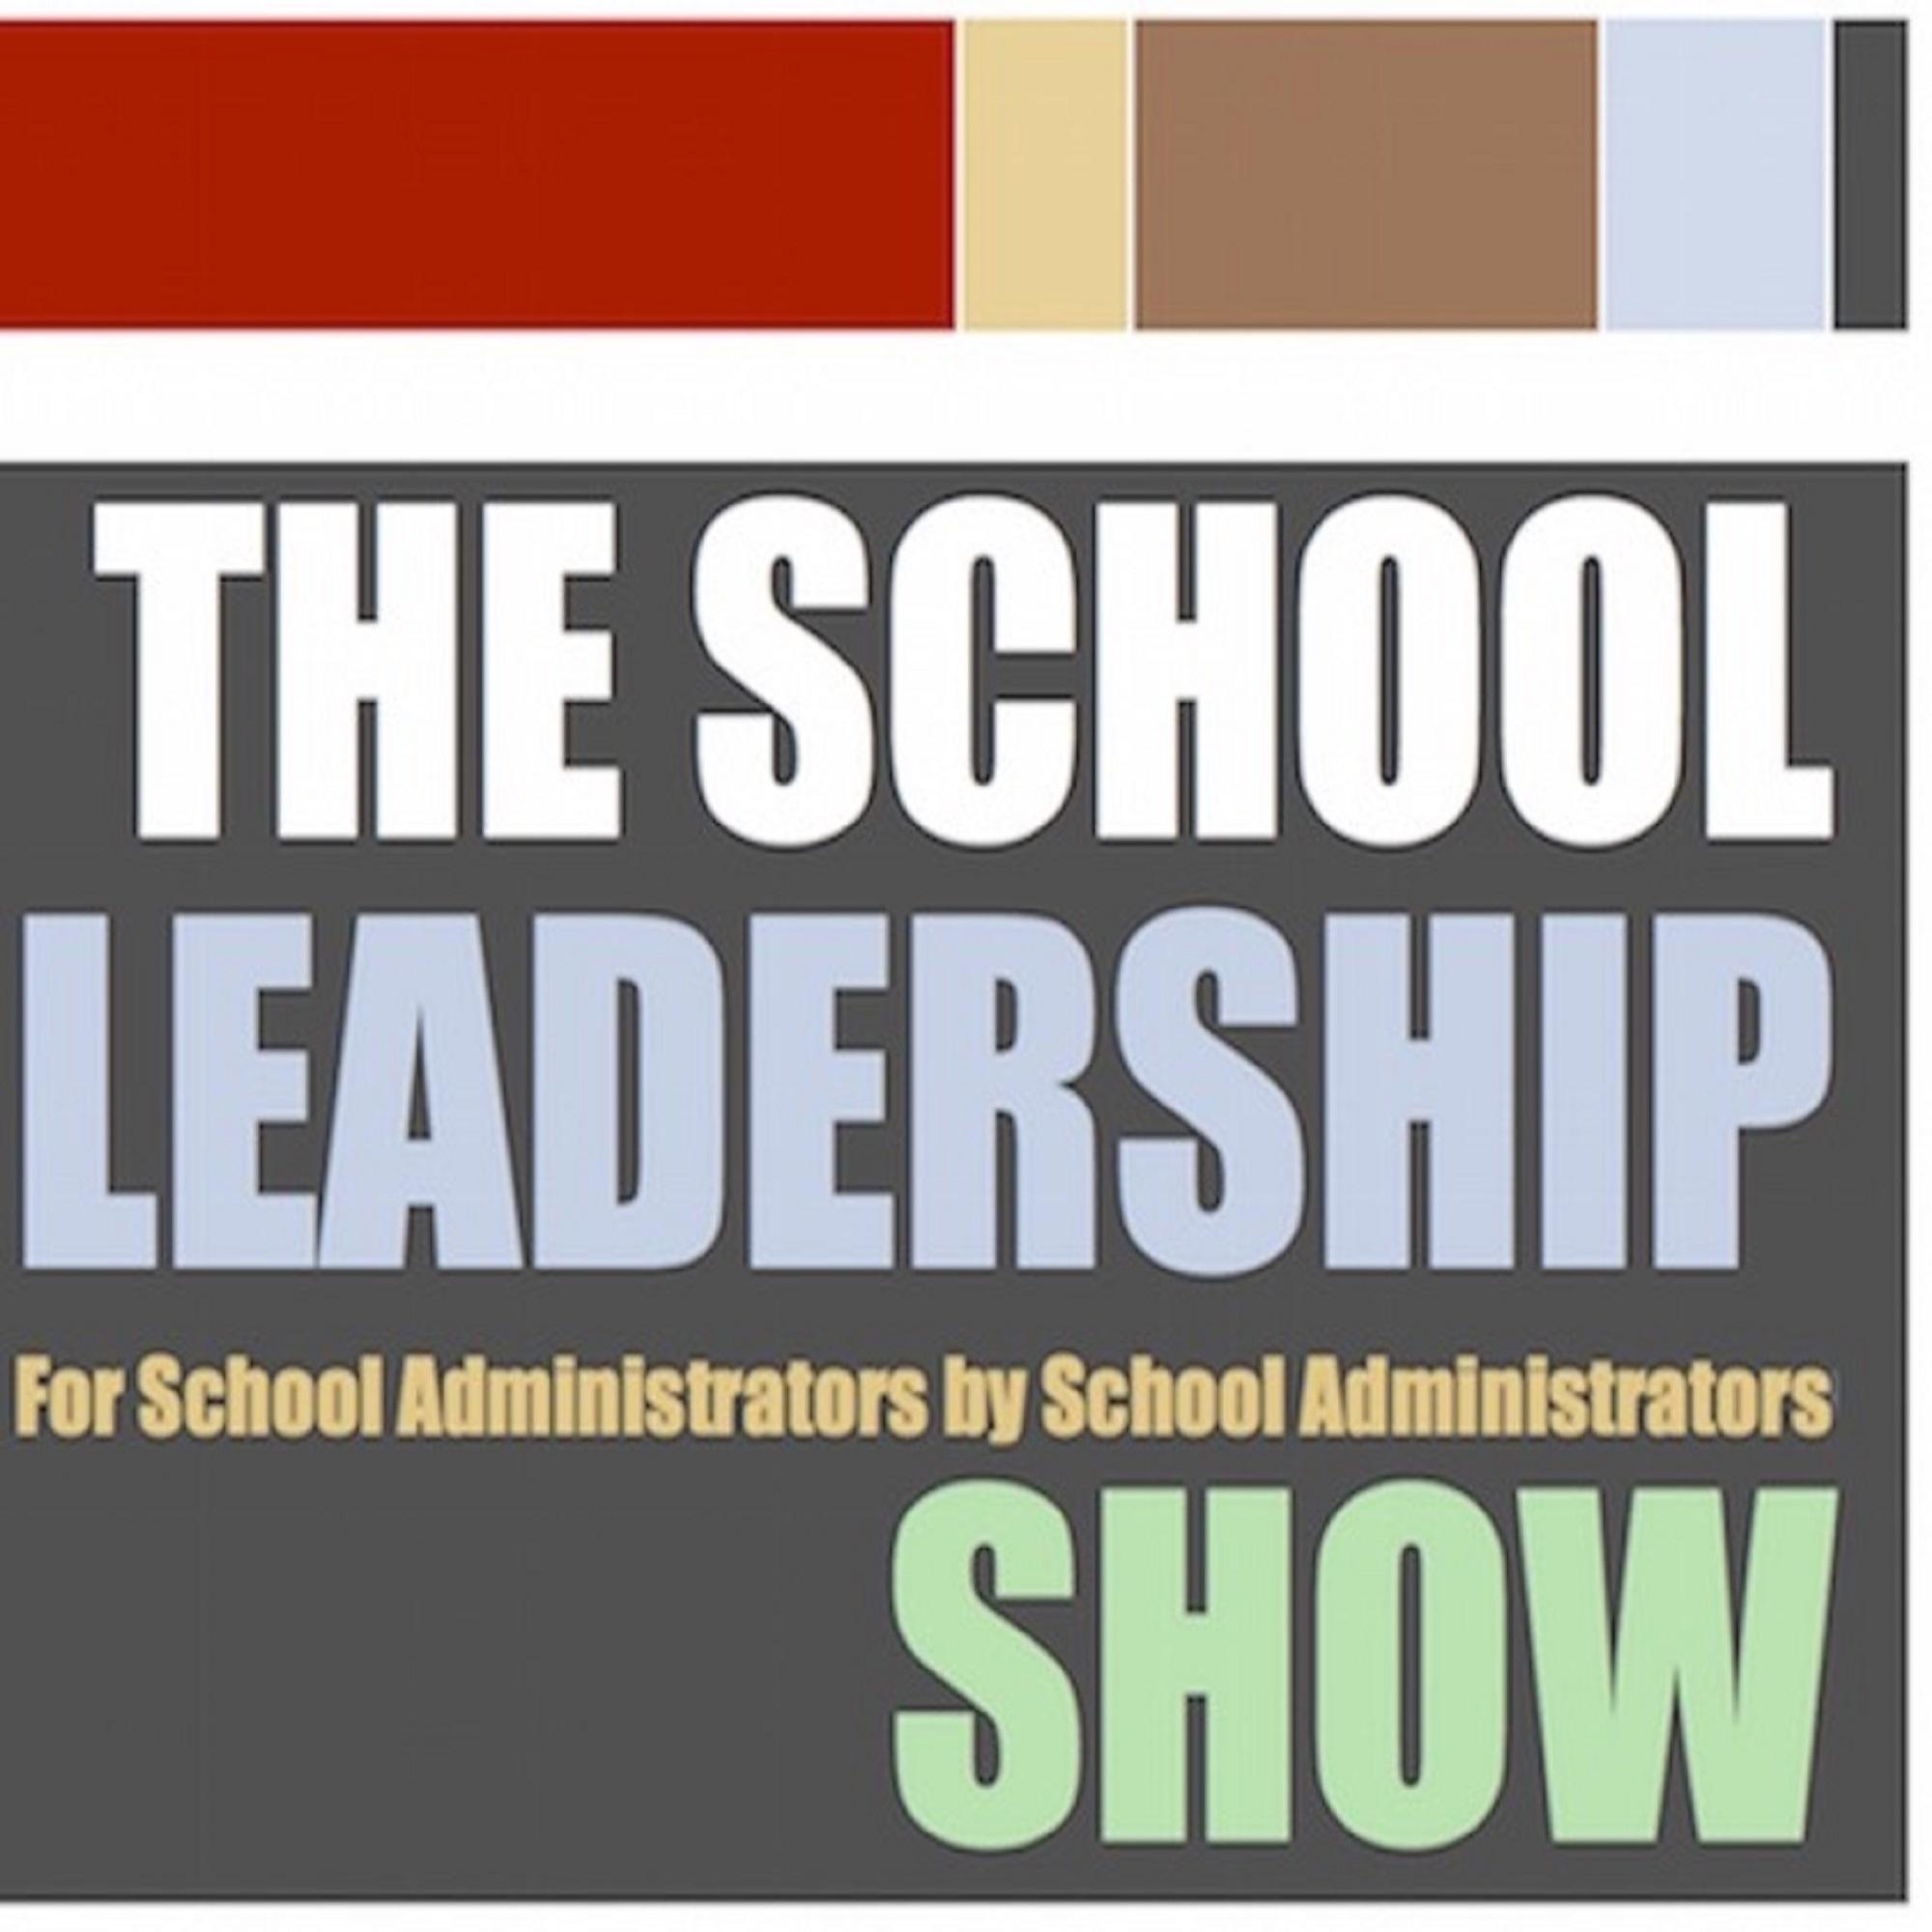 SchoolLeadershipShow.jpg